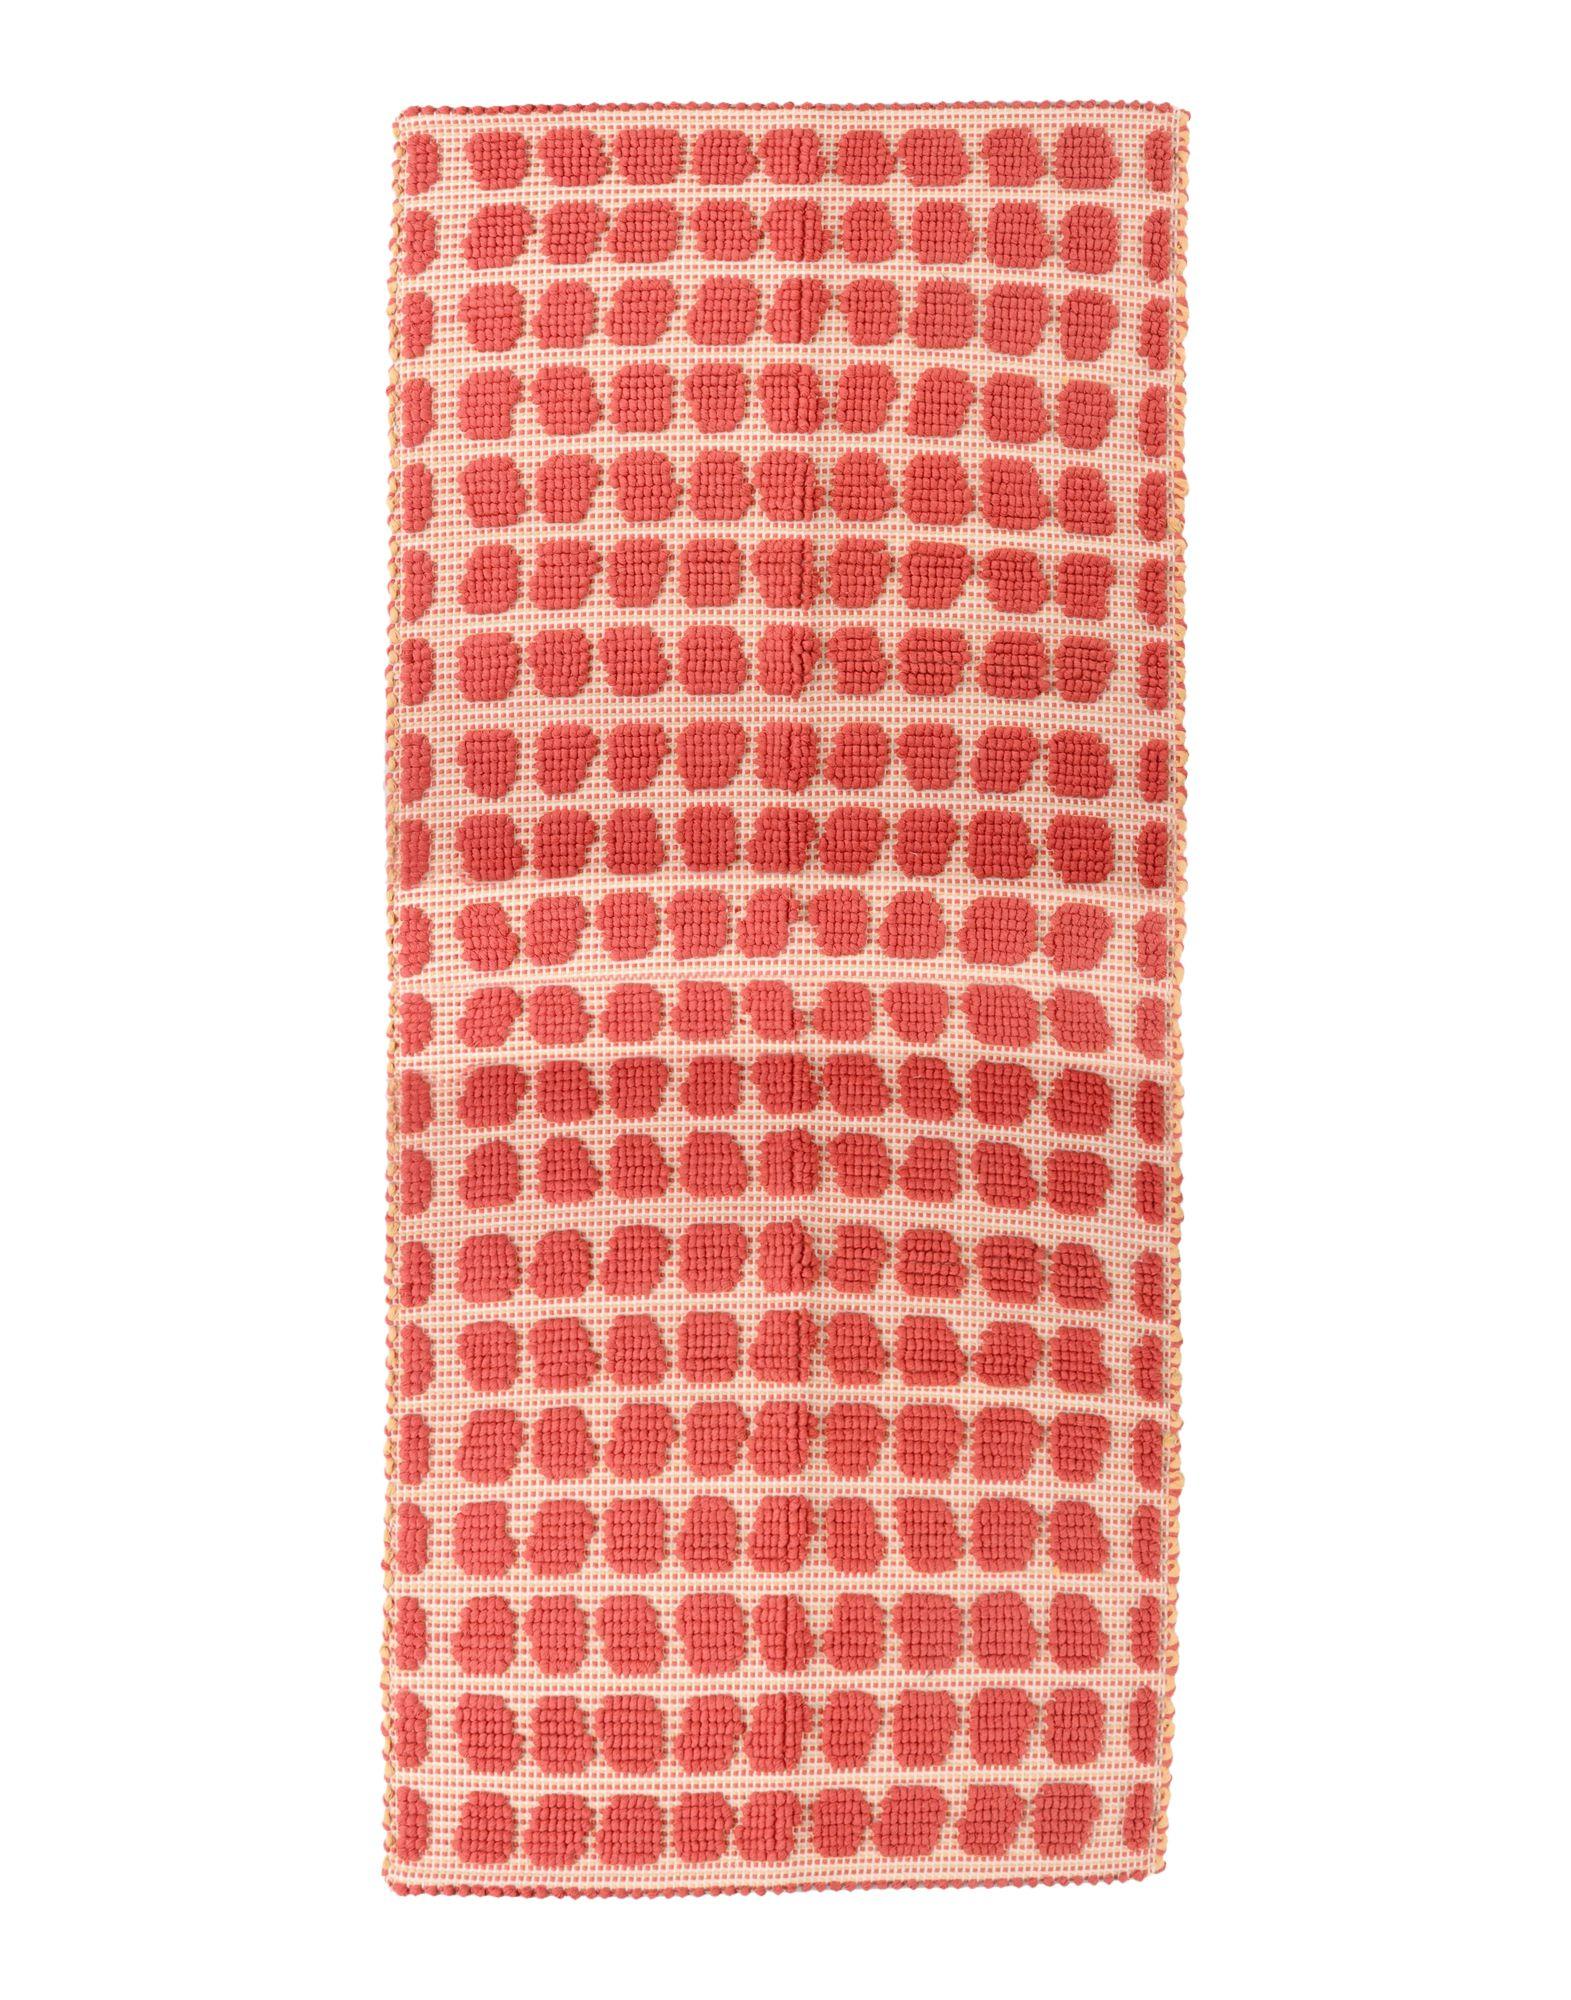 ILARIA.I Unisex Teppich Farbe Altrosa Größe 1